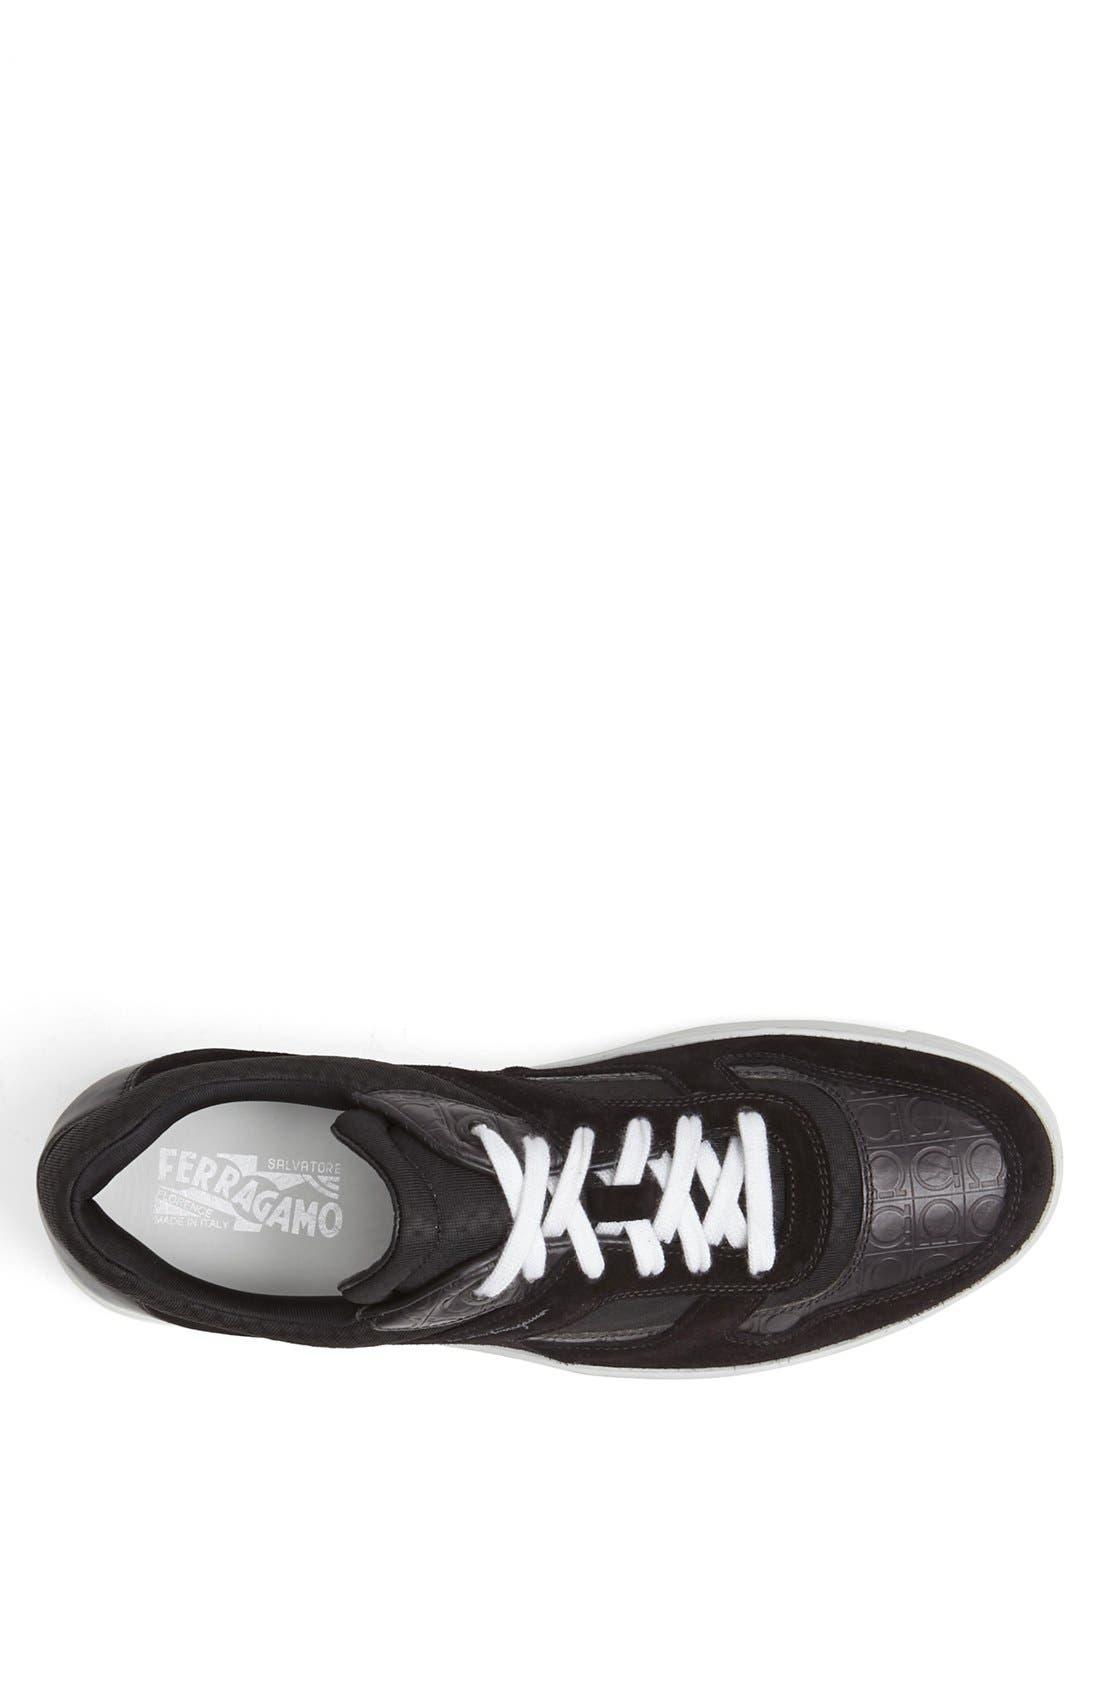 Alternate Image 3  - Salvatore Ferragamo 'Rey' Sneaker